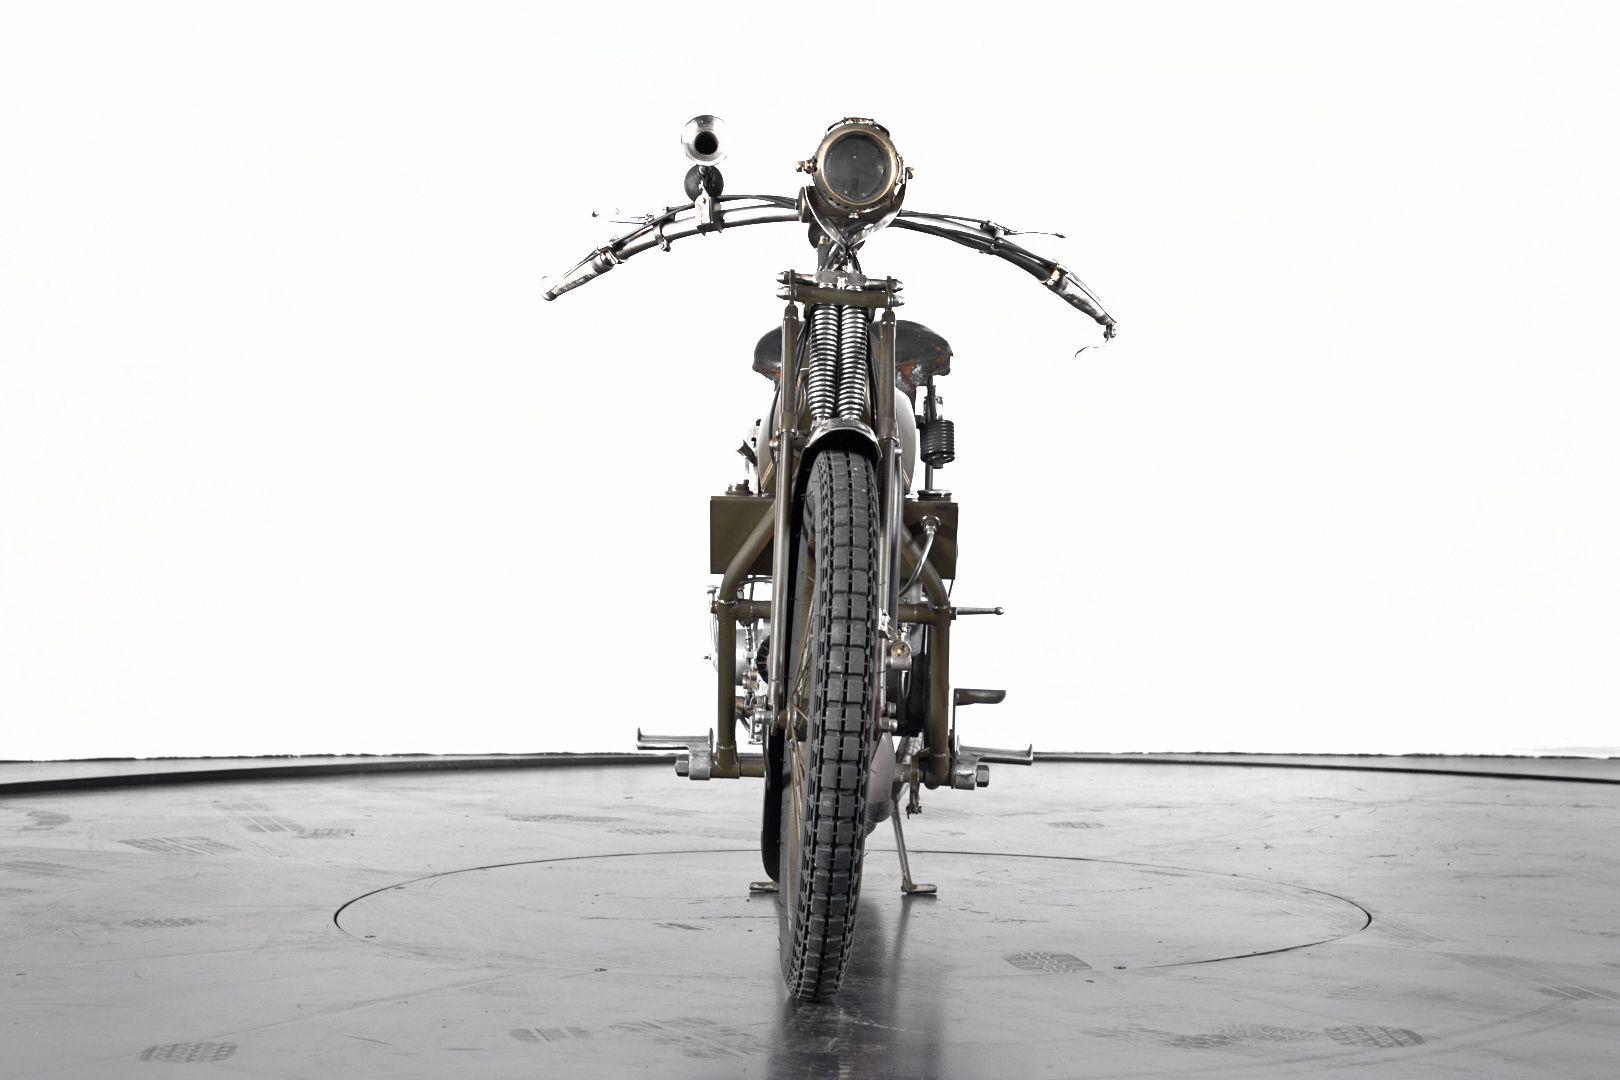 1924 Moto Guzzi 500 Normale 36462